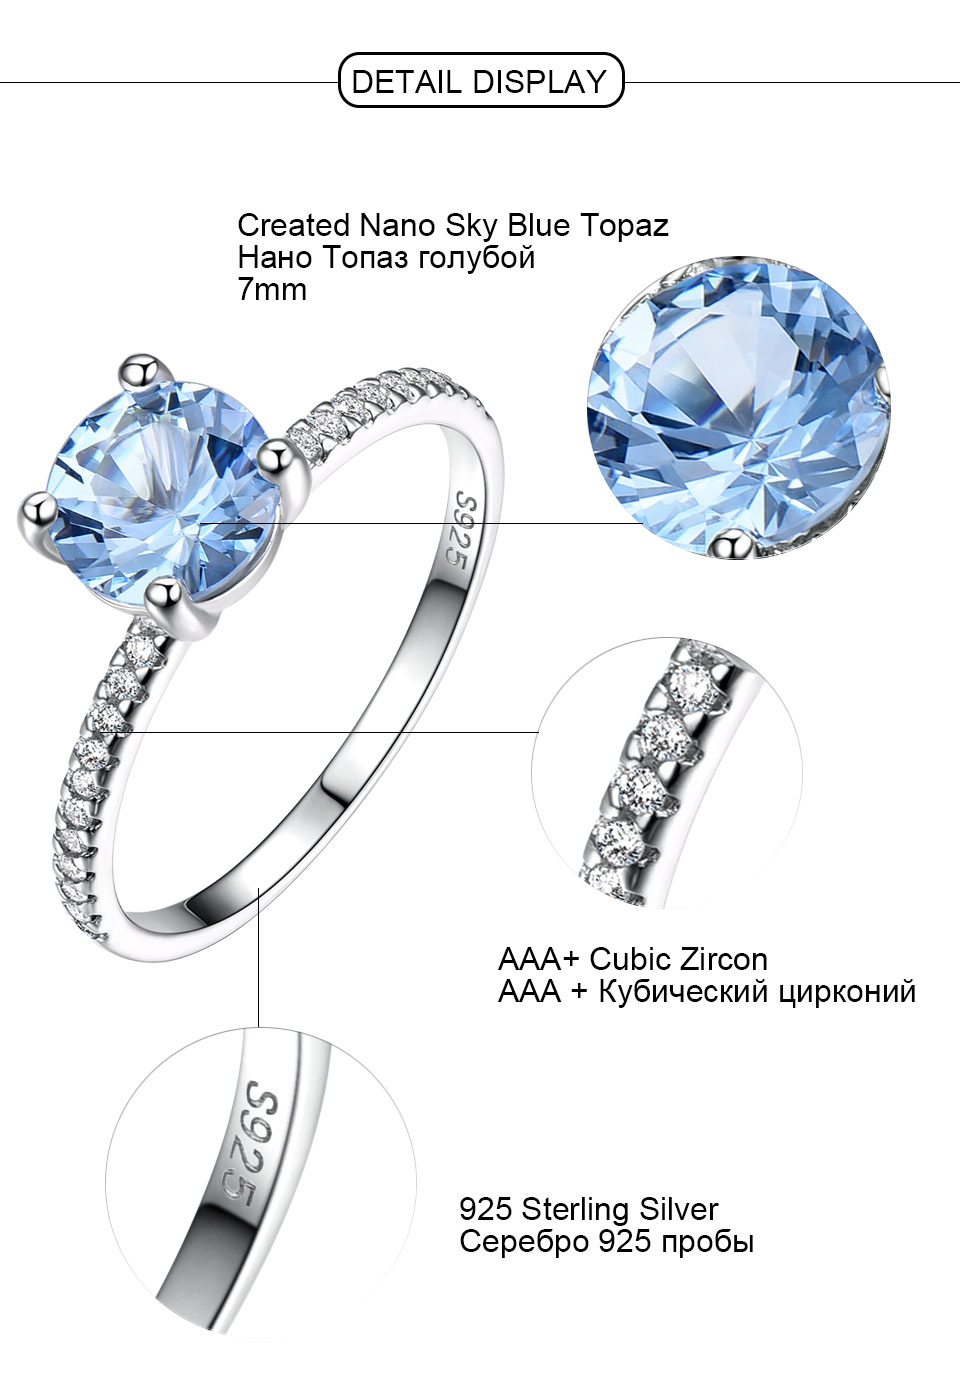 UMCHO-Sky-blue-topaz-silver-sterling-rings-for-women-RUJ065B-1-pc_05